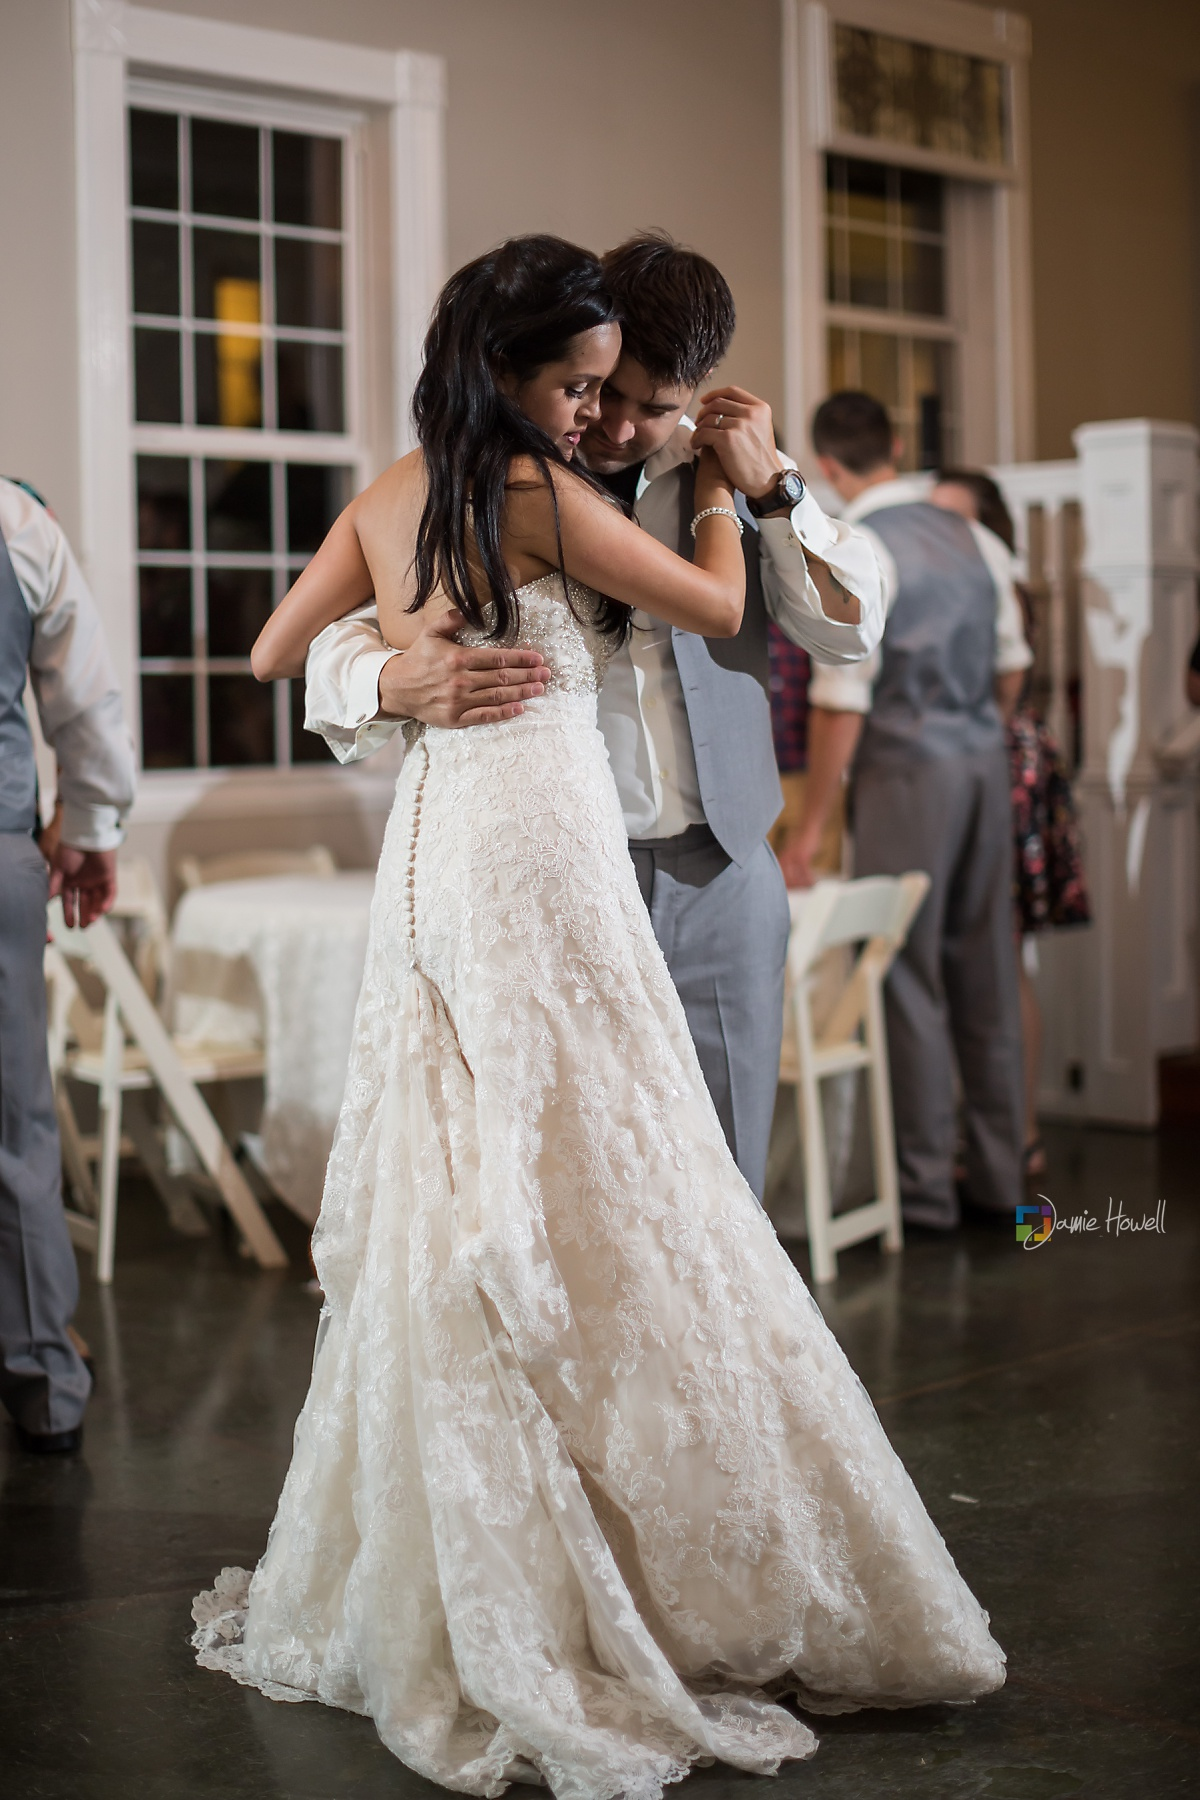 Something Special Newnan Wedding (20)